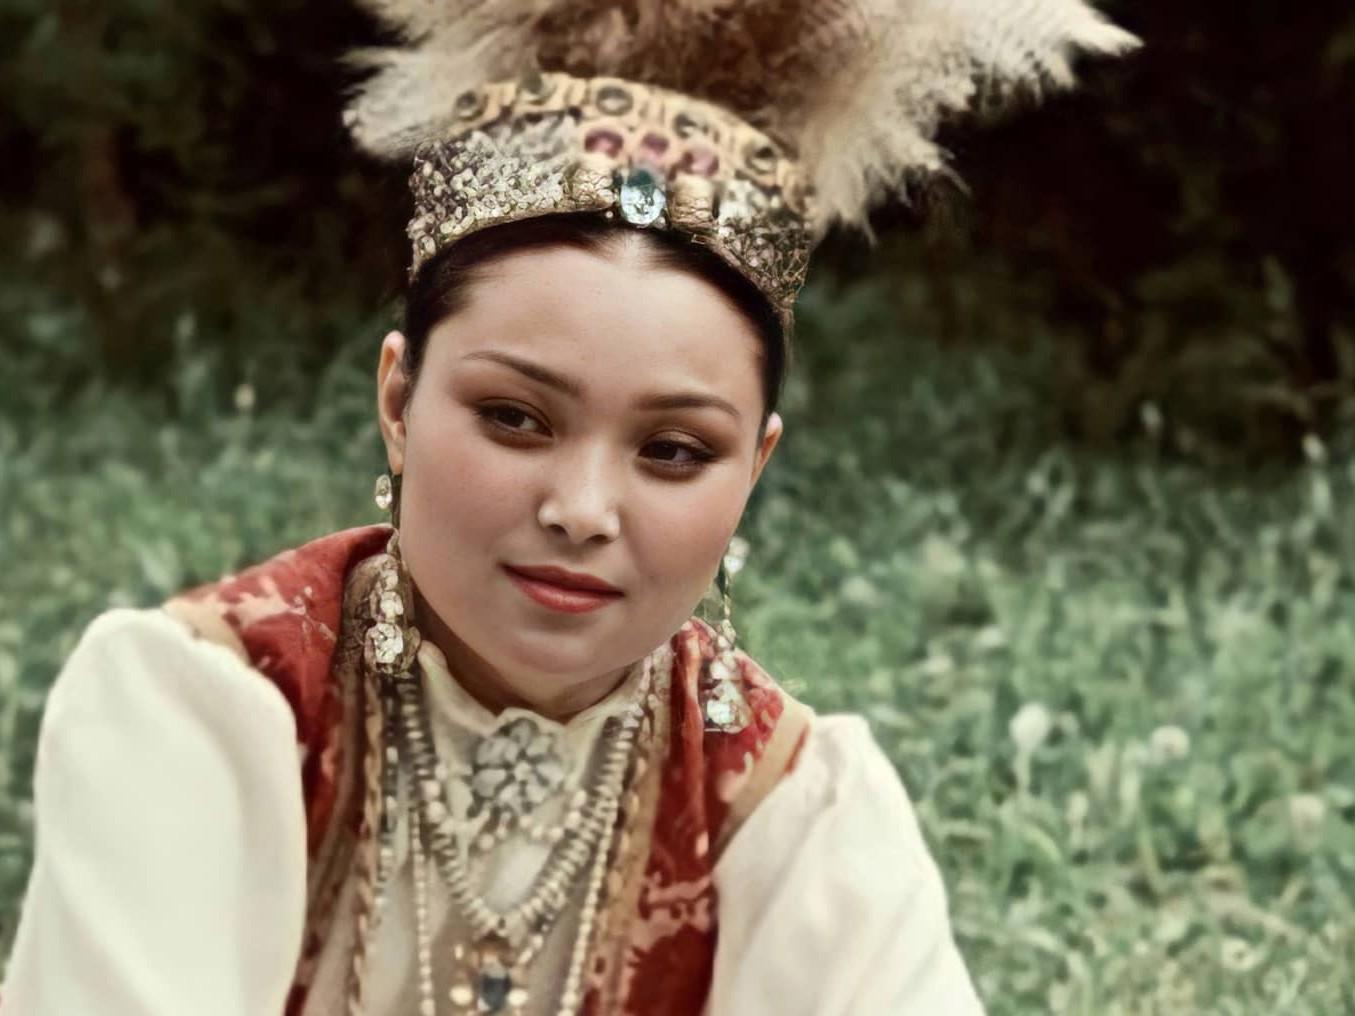 Info Shymkent - Famous Kazakh People for example Opera Singer Roza Baglanova